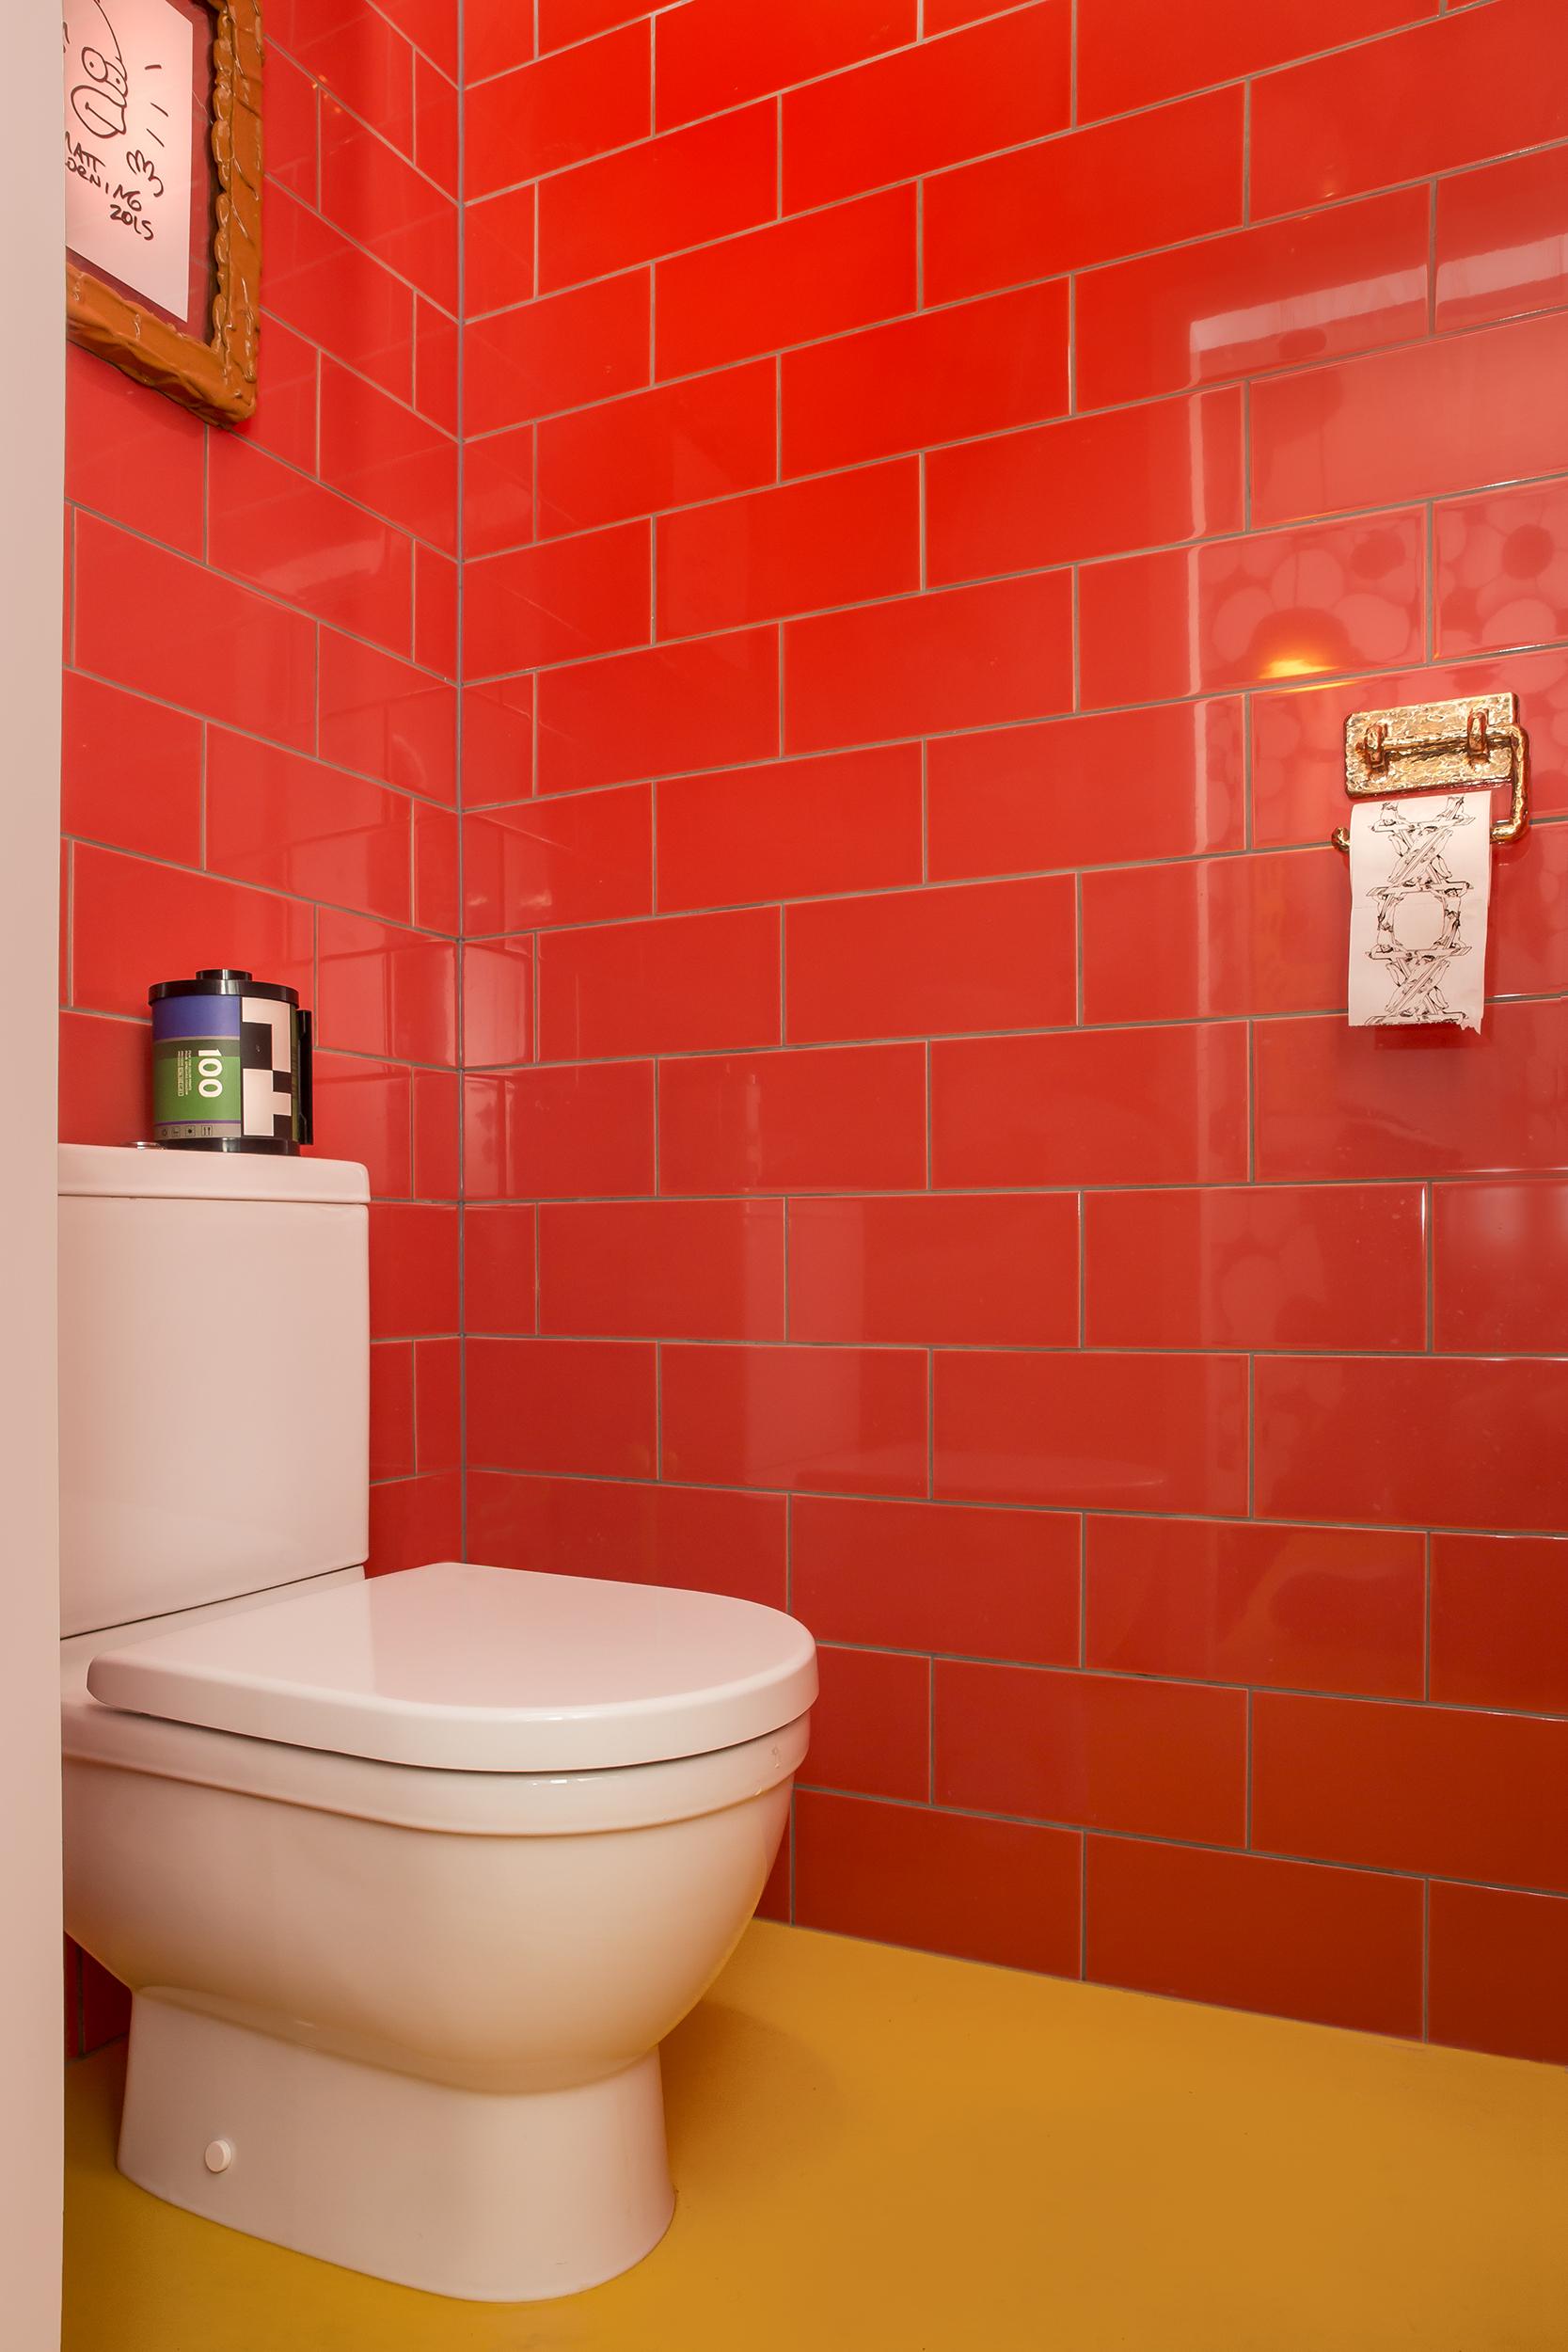 StudioJob-HQ-Toilet1